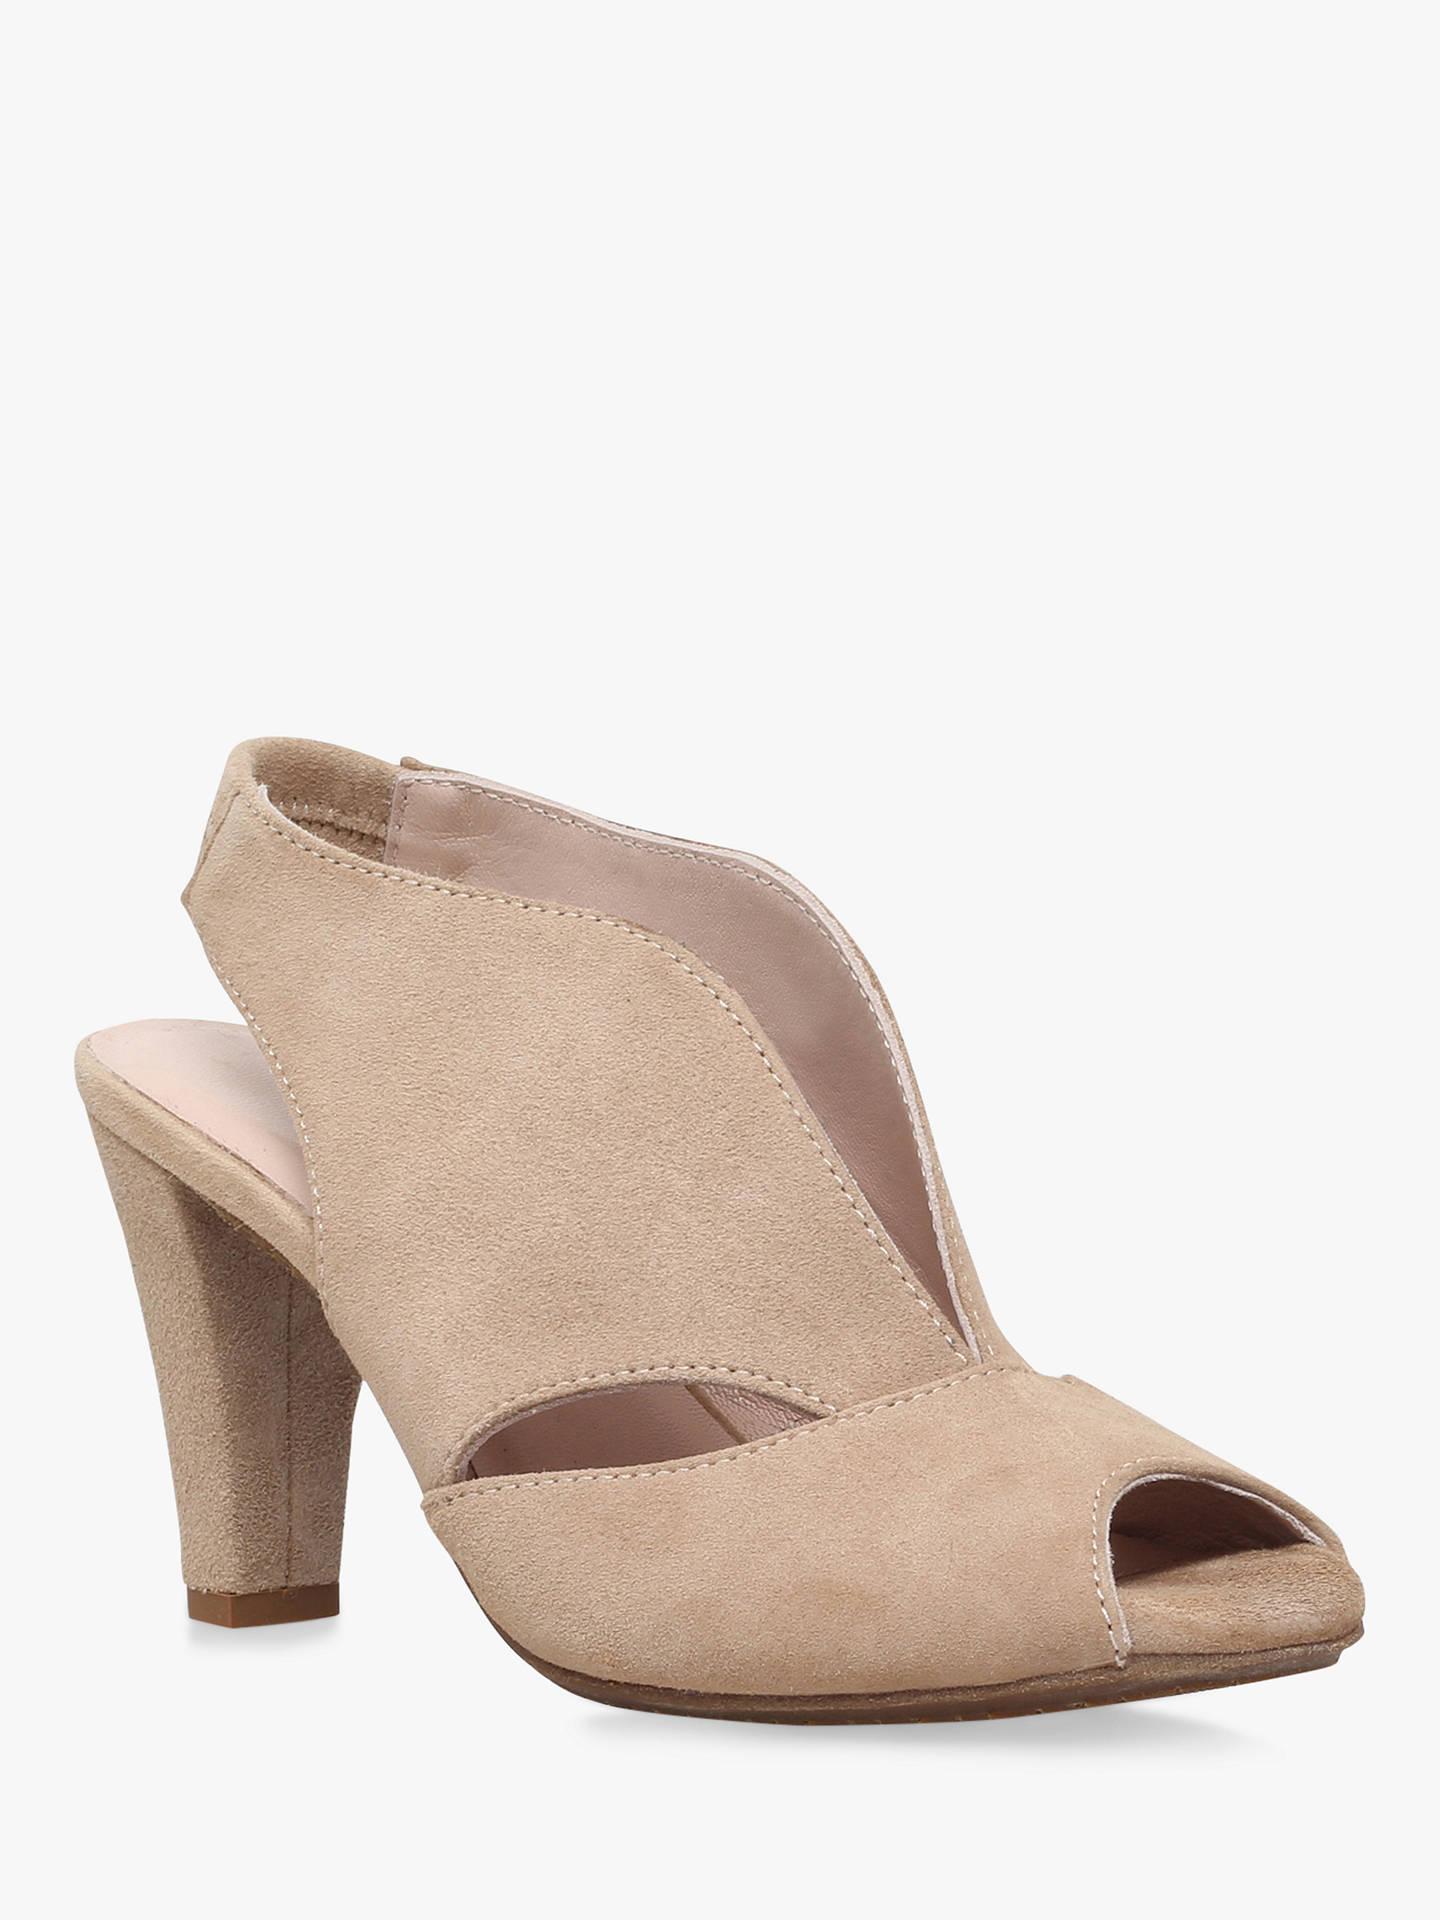 0ebfab95e2f Carvela Comfort Arabella Cone Heel Open Toe Court Shoes at John ...